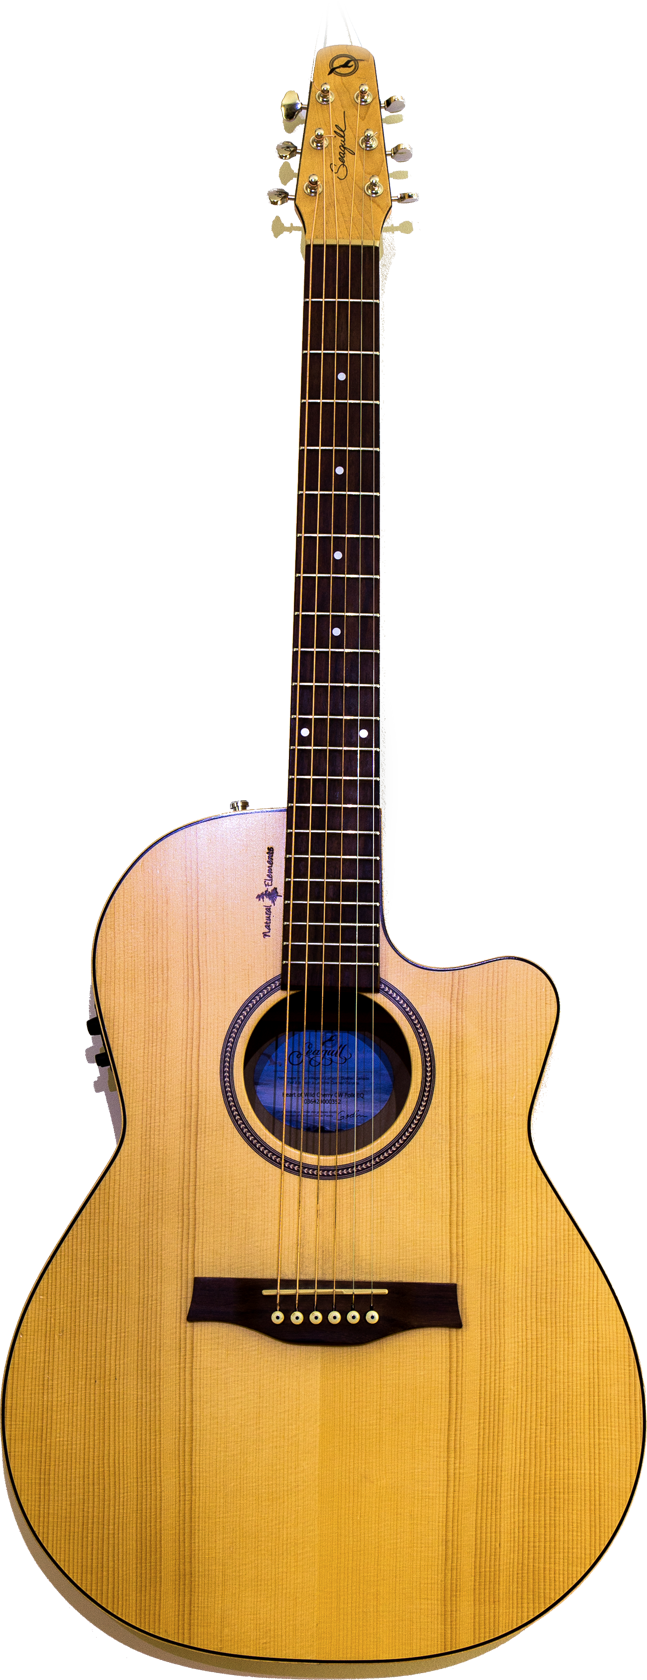 Choisir sa guitare acoustique - Corde Nylon ou métal